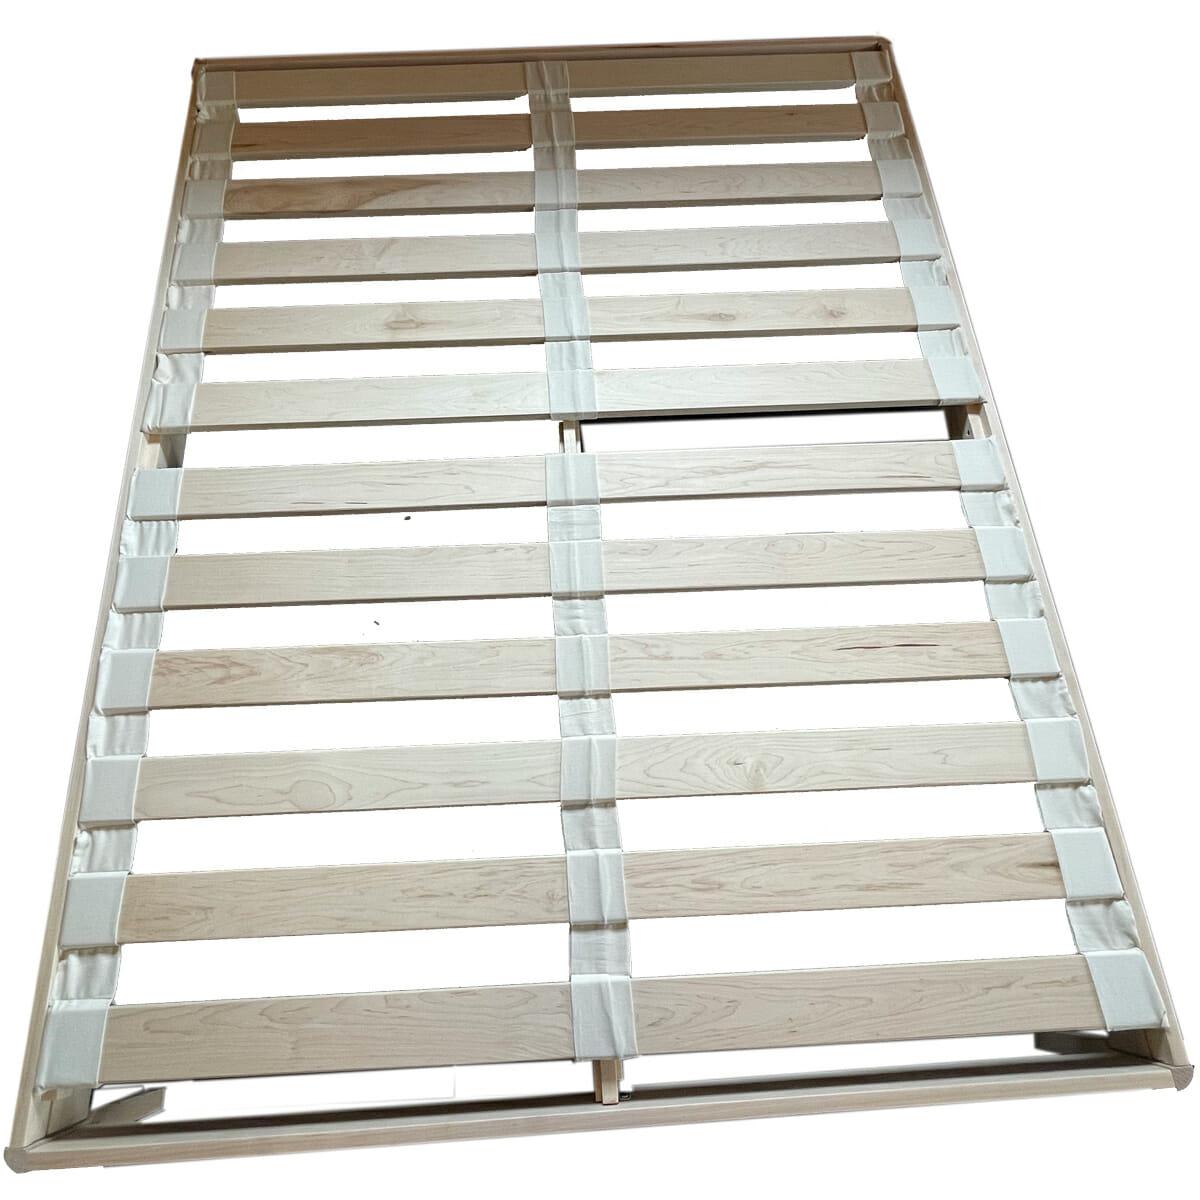 Maple Platform Bed -Maple Slats - TopView